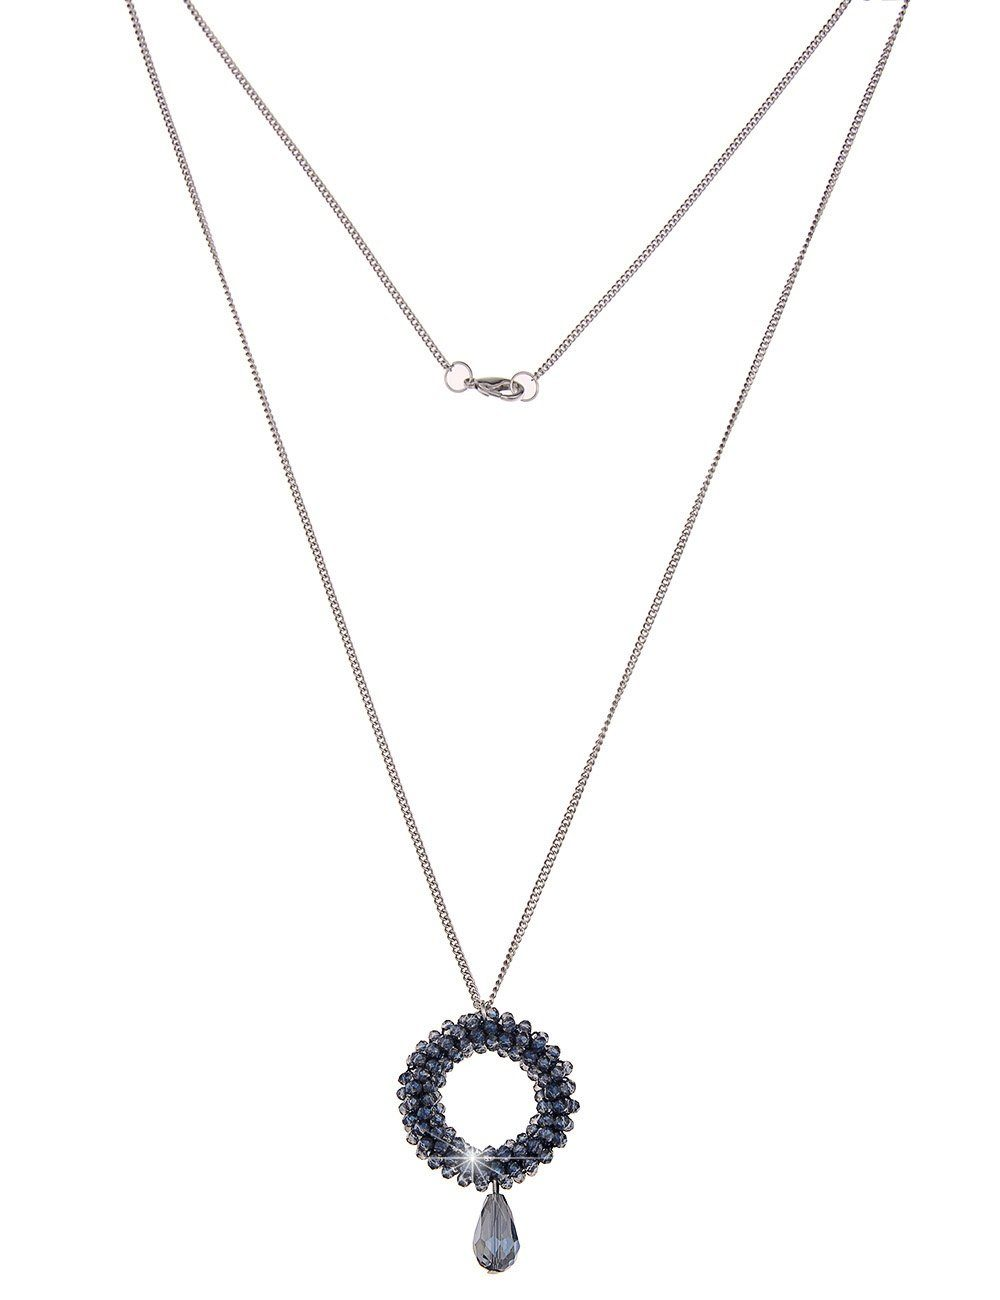 Leslii Halskette mit Ringanhänger